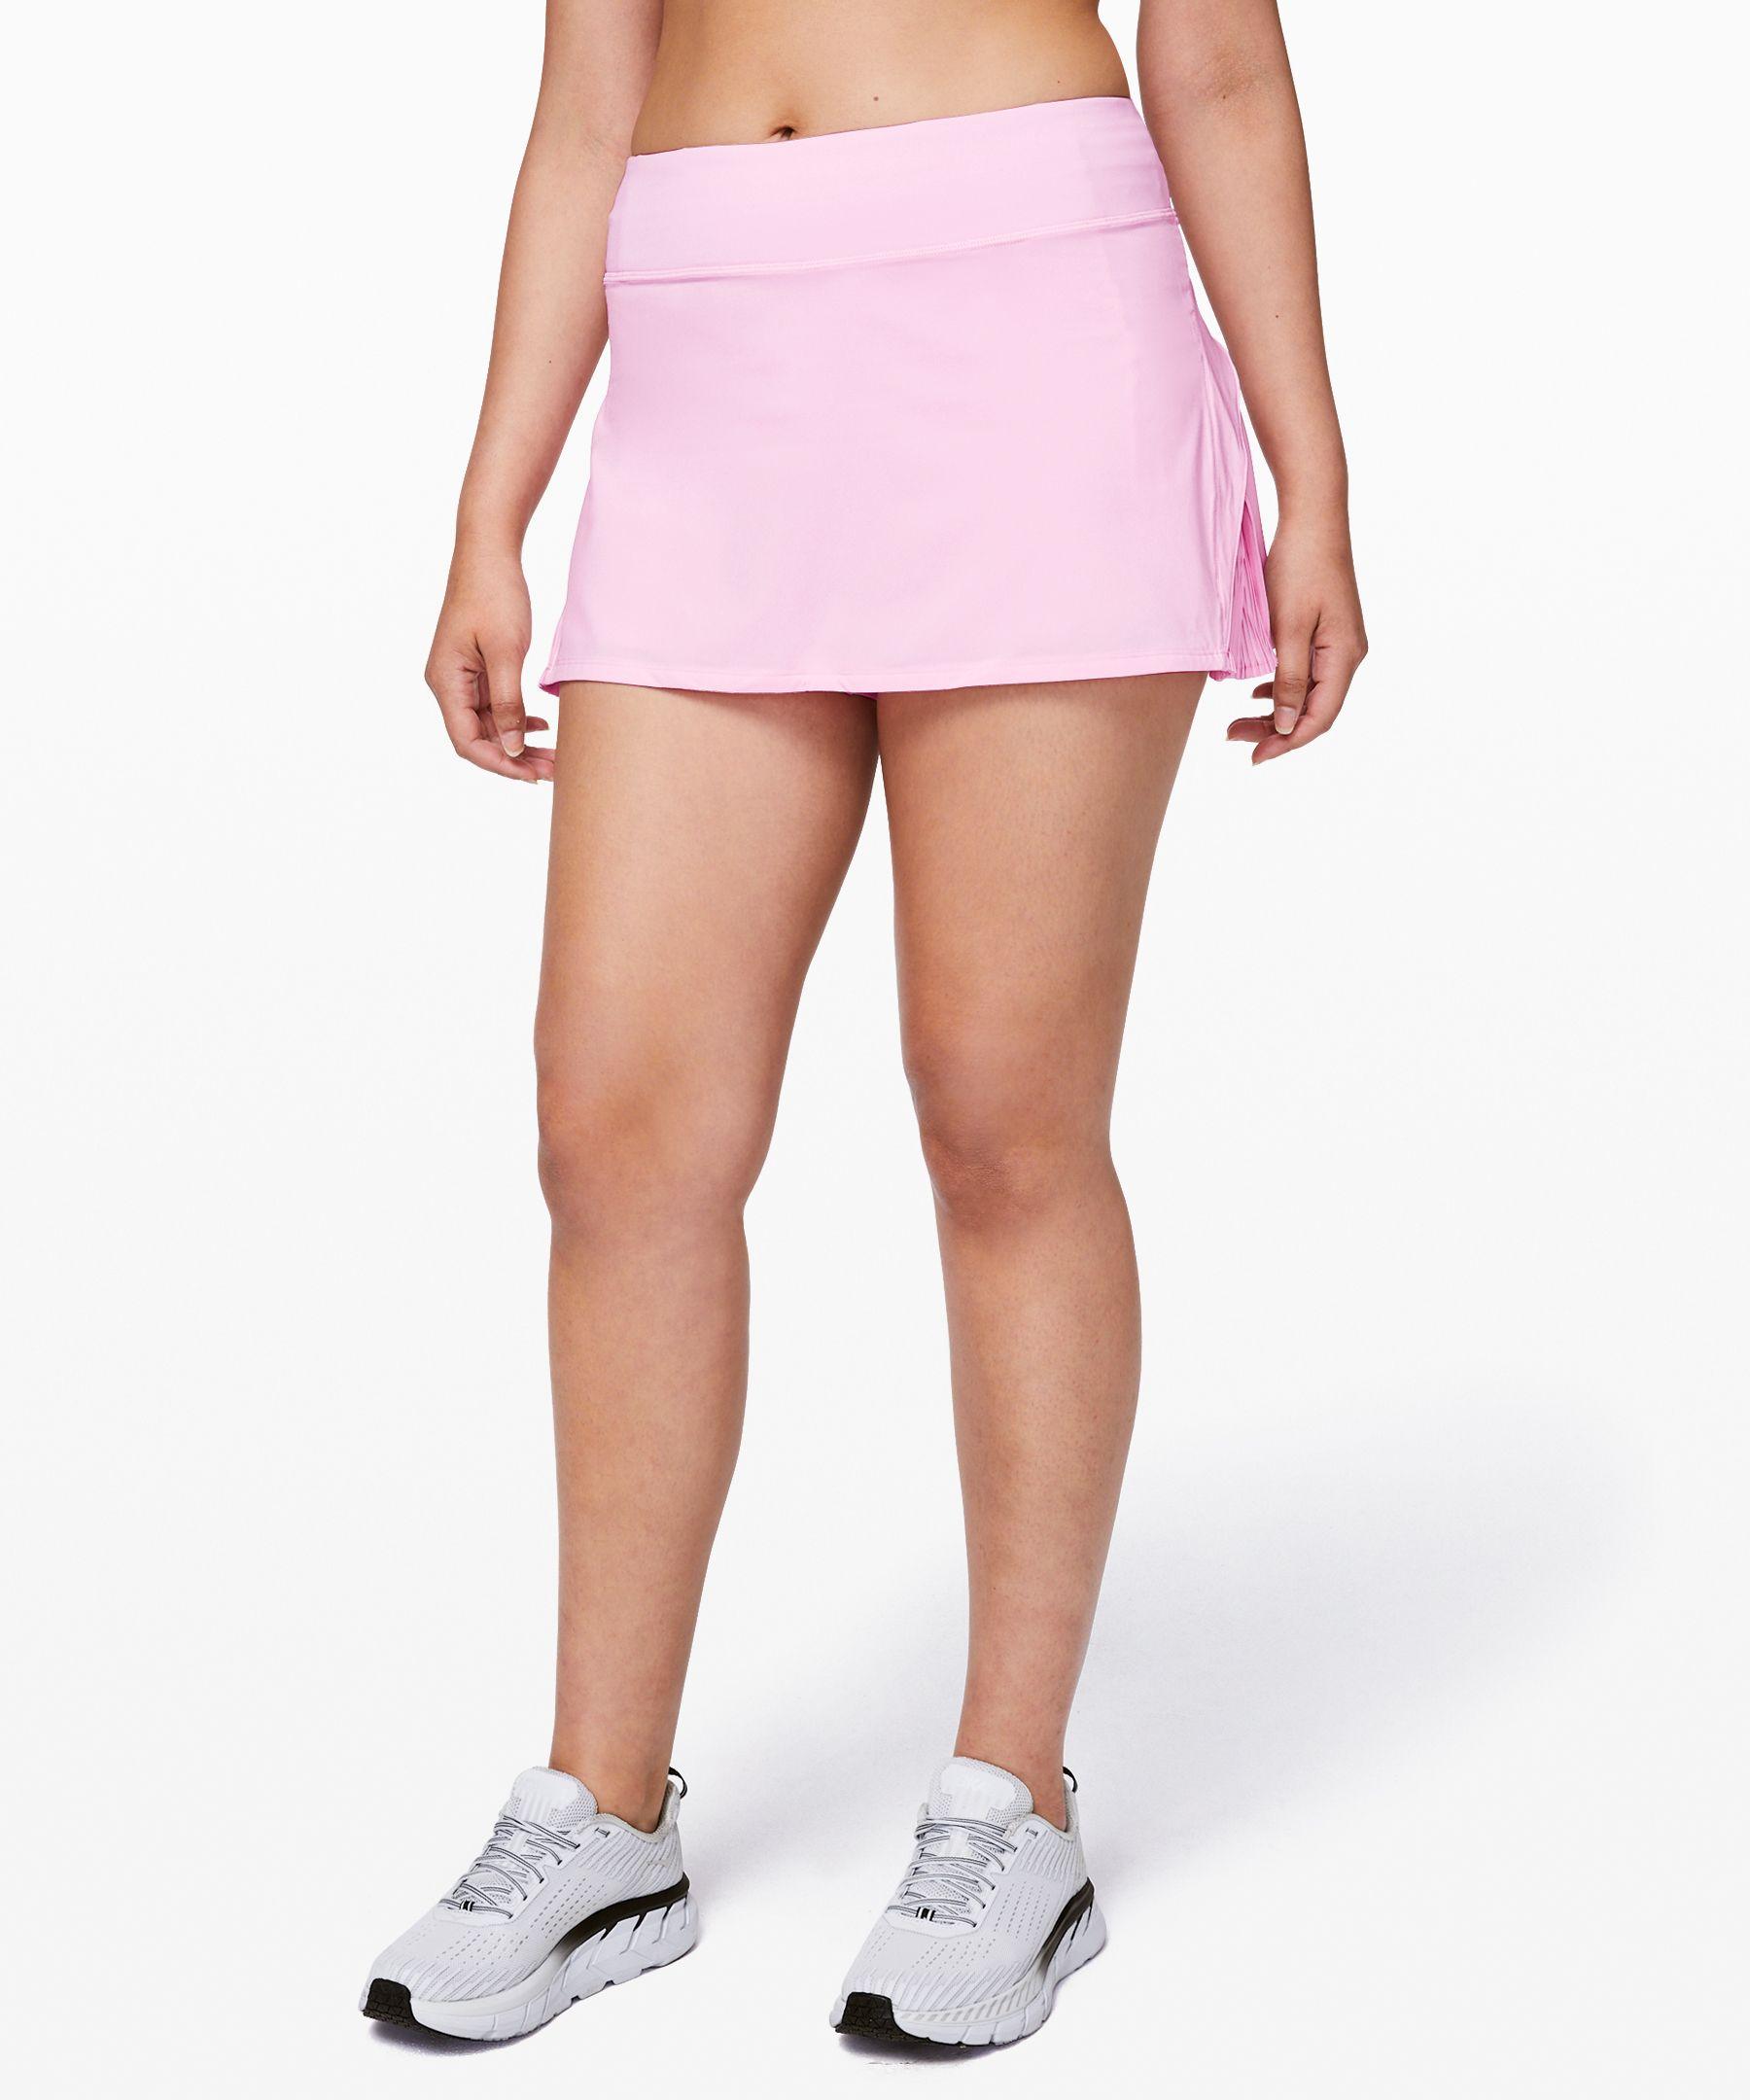 c71c11b745 Play Off The Pleats Skirt *13